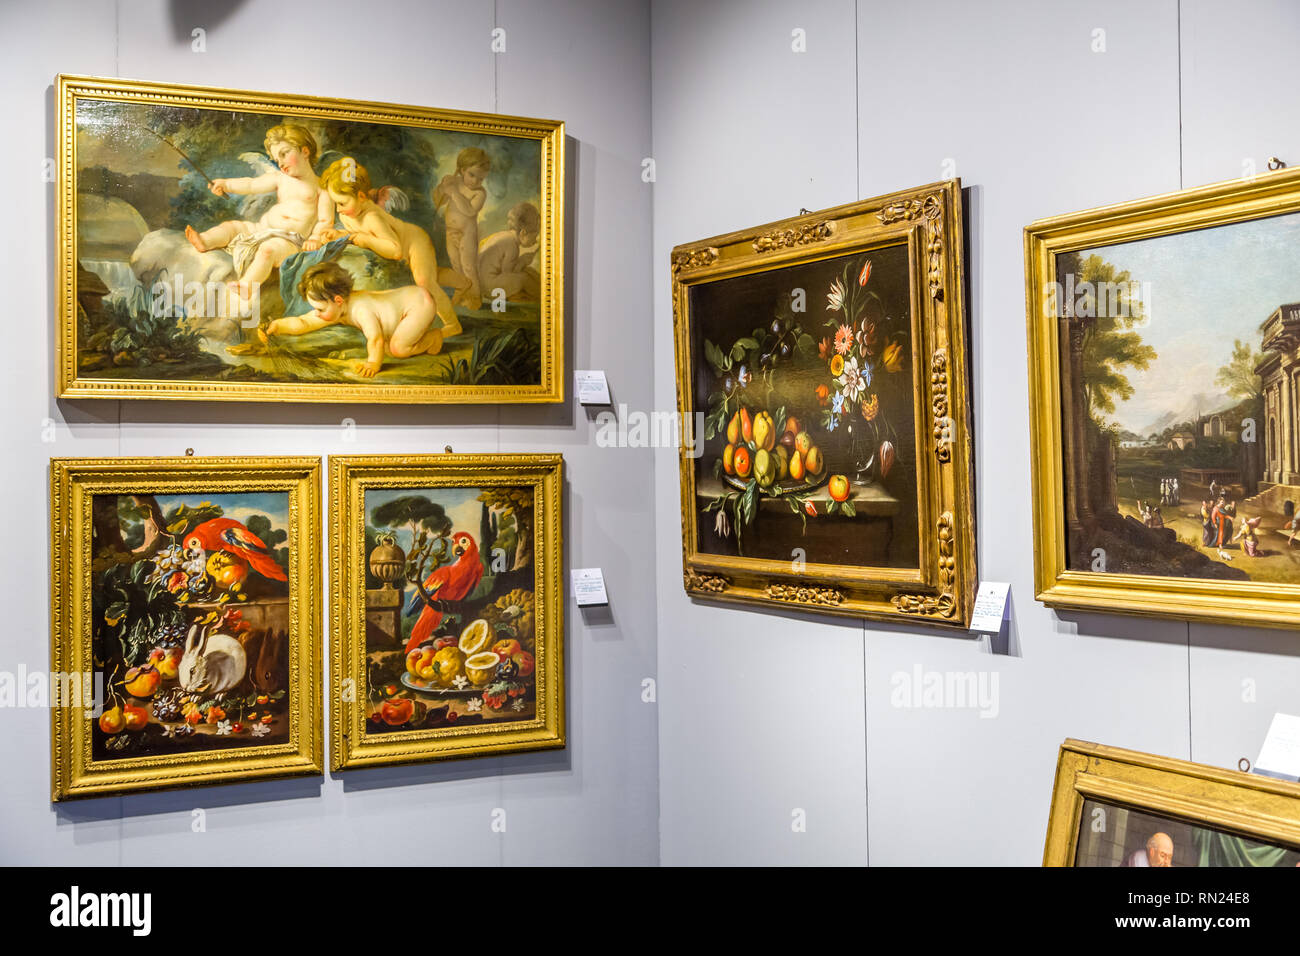 Modena, Italy  15th February, 2019  Priceless artworks